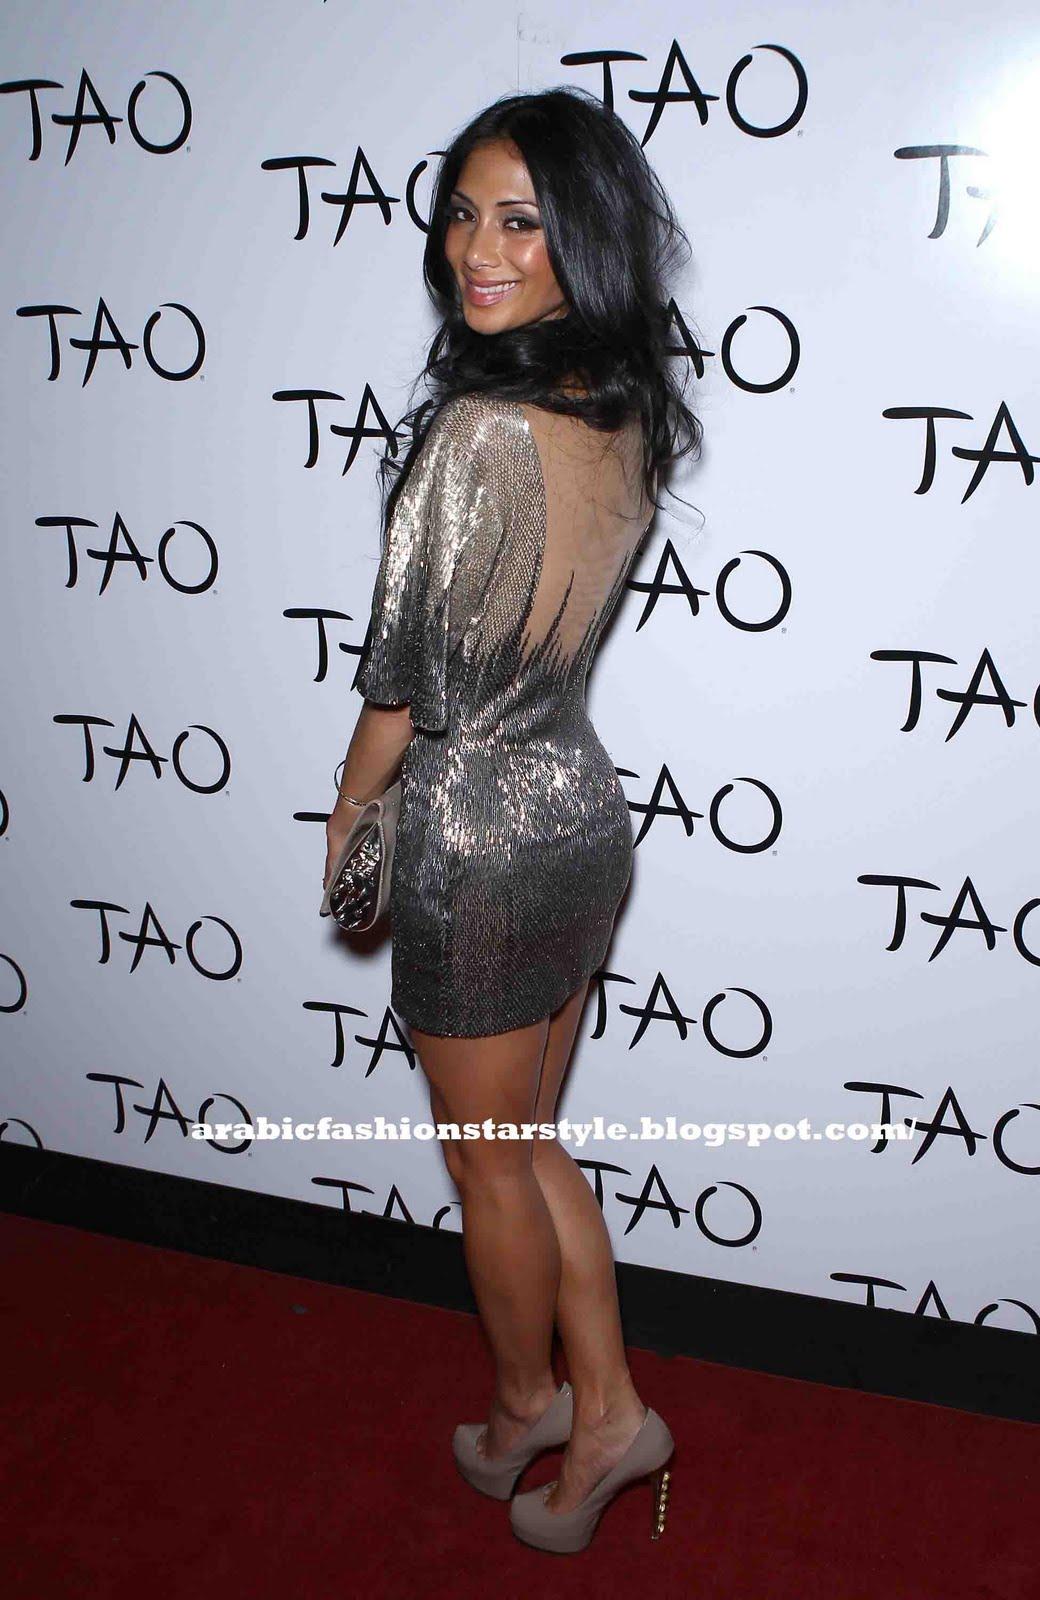 http://1.bp.blogspot.com/-WMitivtaW5s/Tgm13YjGOUI/AAAAAAAAAPs/DmTJGQv2xjI/s1600/06801_celebrity_paradise.com_TheElder_NicoleScherzinger2011_06_25_celebratesherbirthdayatTaoNightclubinLasVega8_122_373lo.jpg